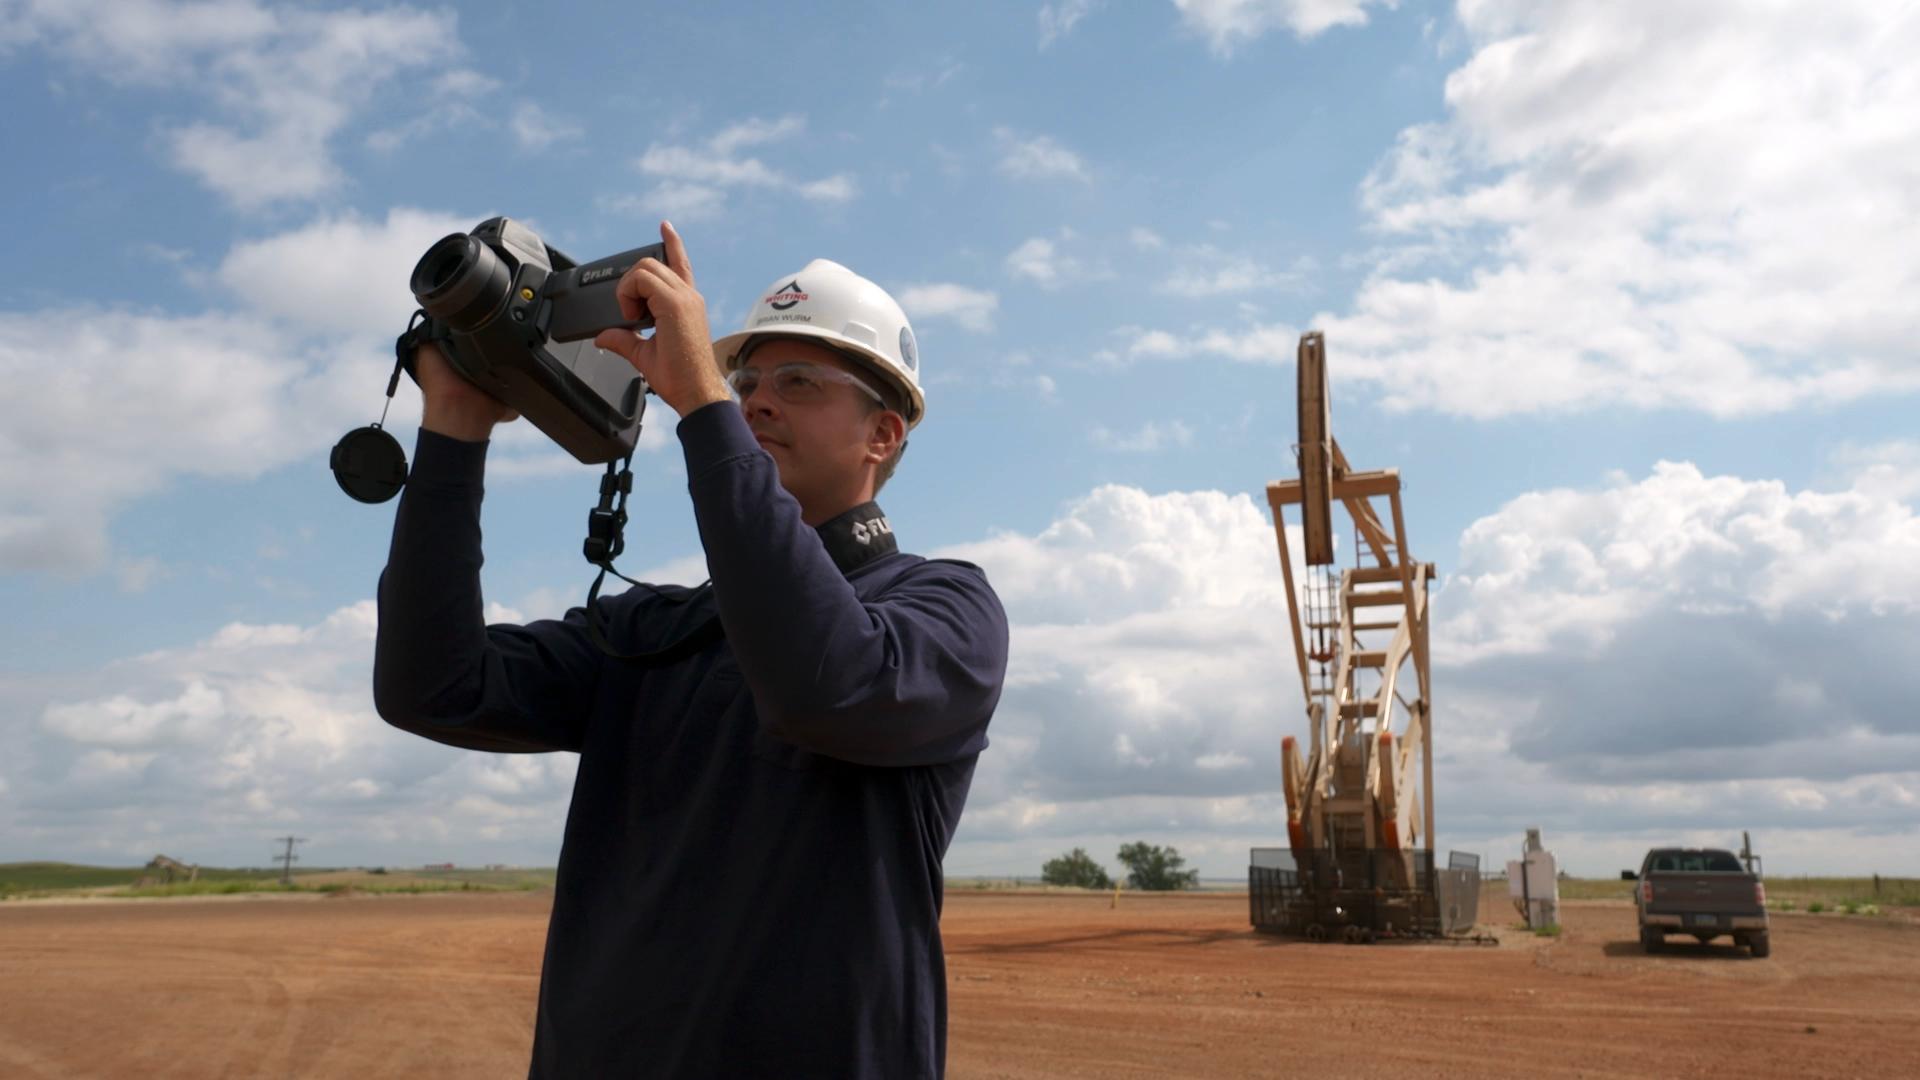 Person holding viewing equipment near an oil pump.